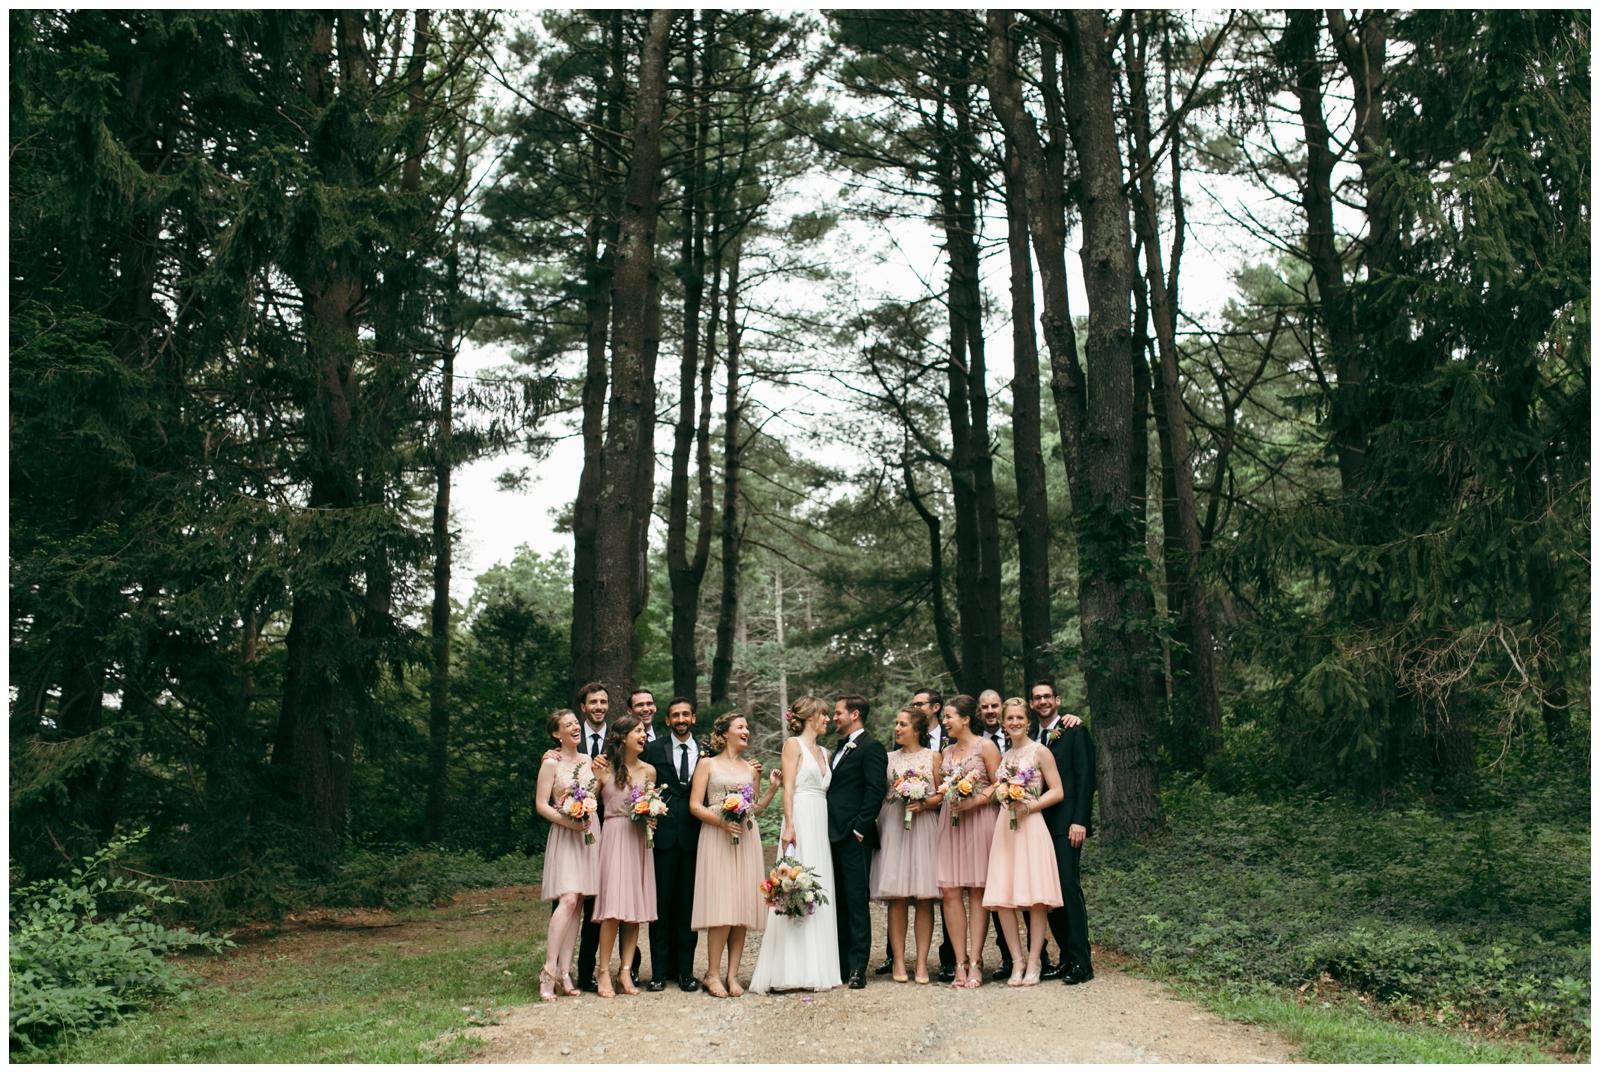 Moraine-Farm-wedding-Bailey-Q-Photo-Massachusetts-wedding-photpgrapher-036.jpg